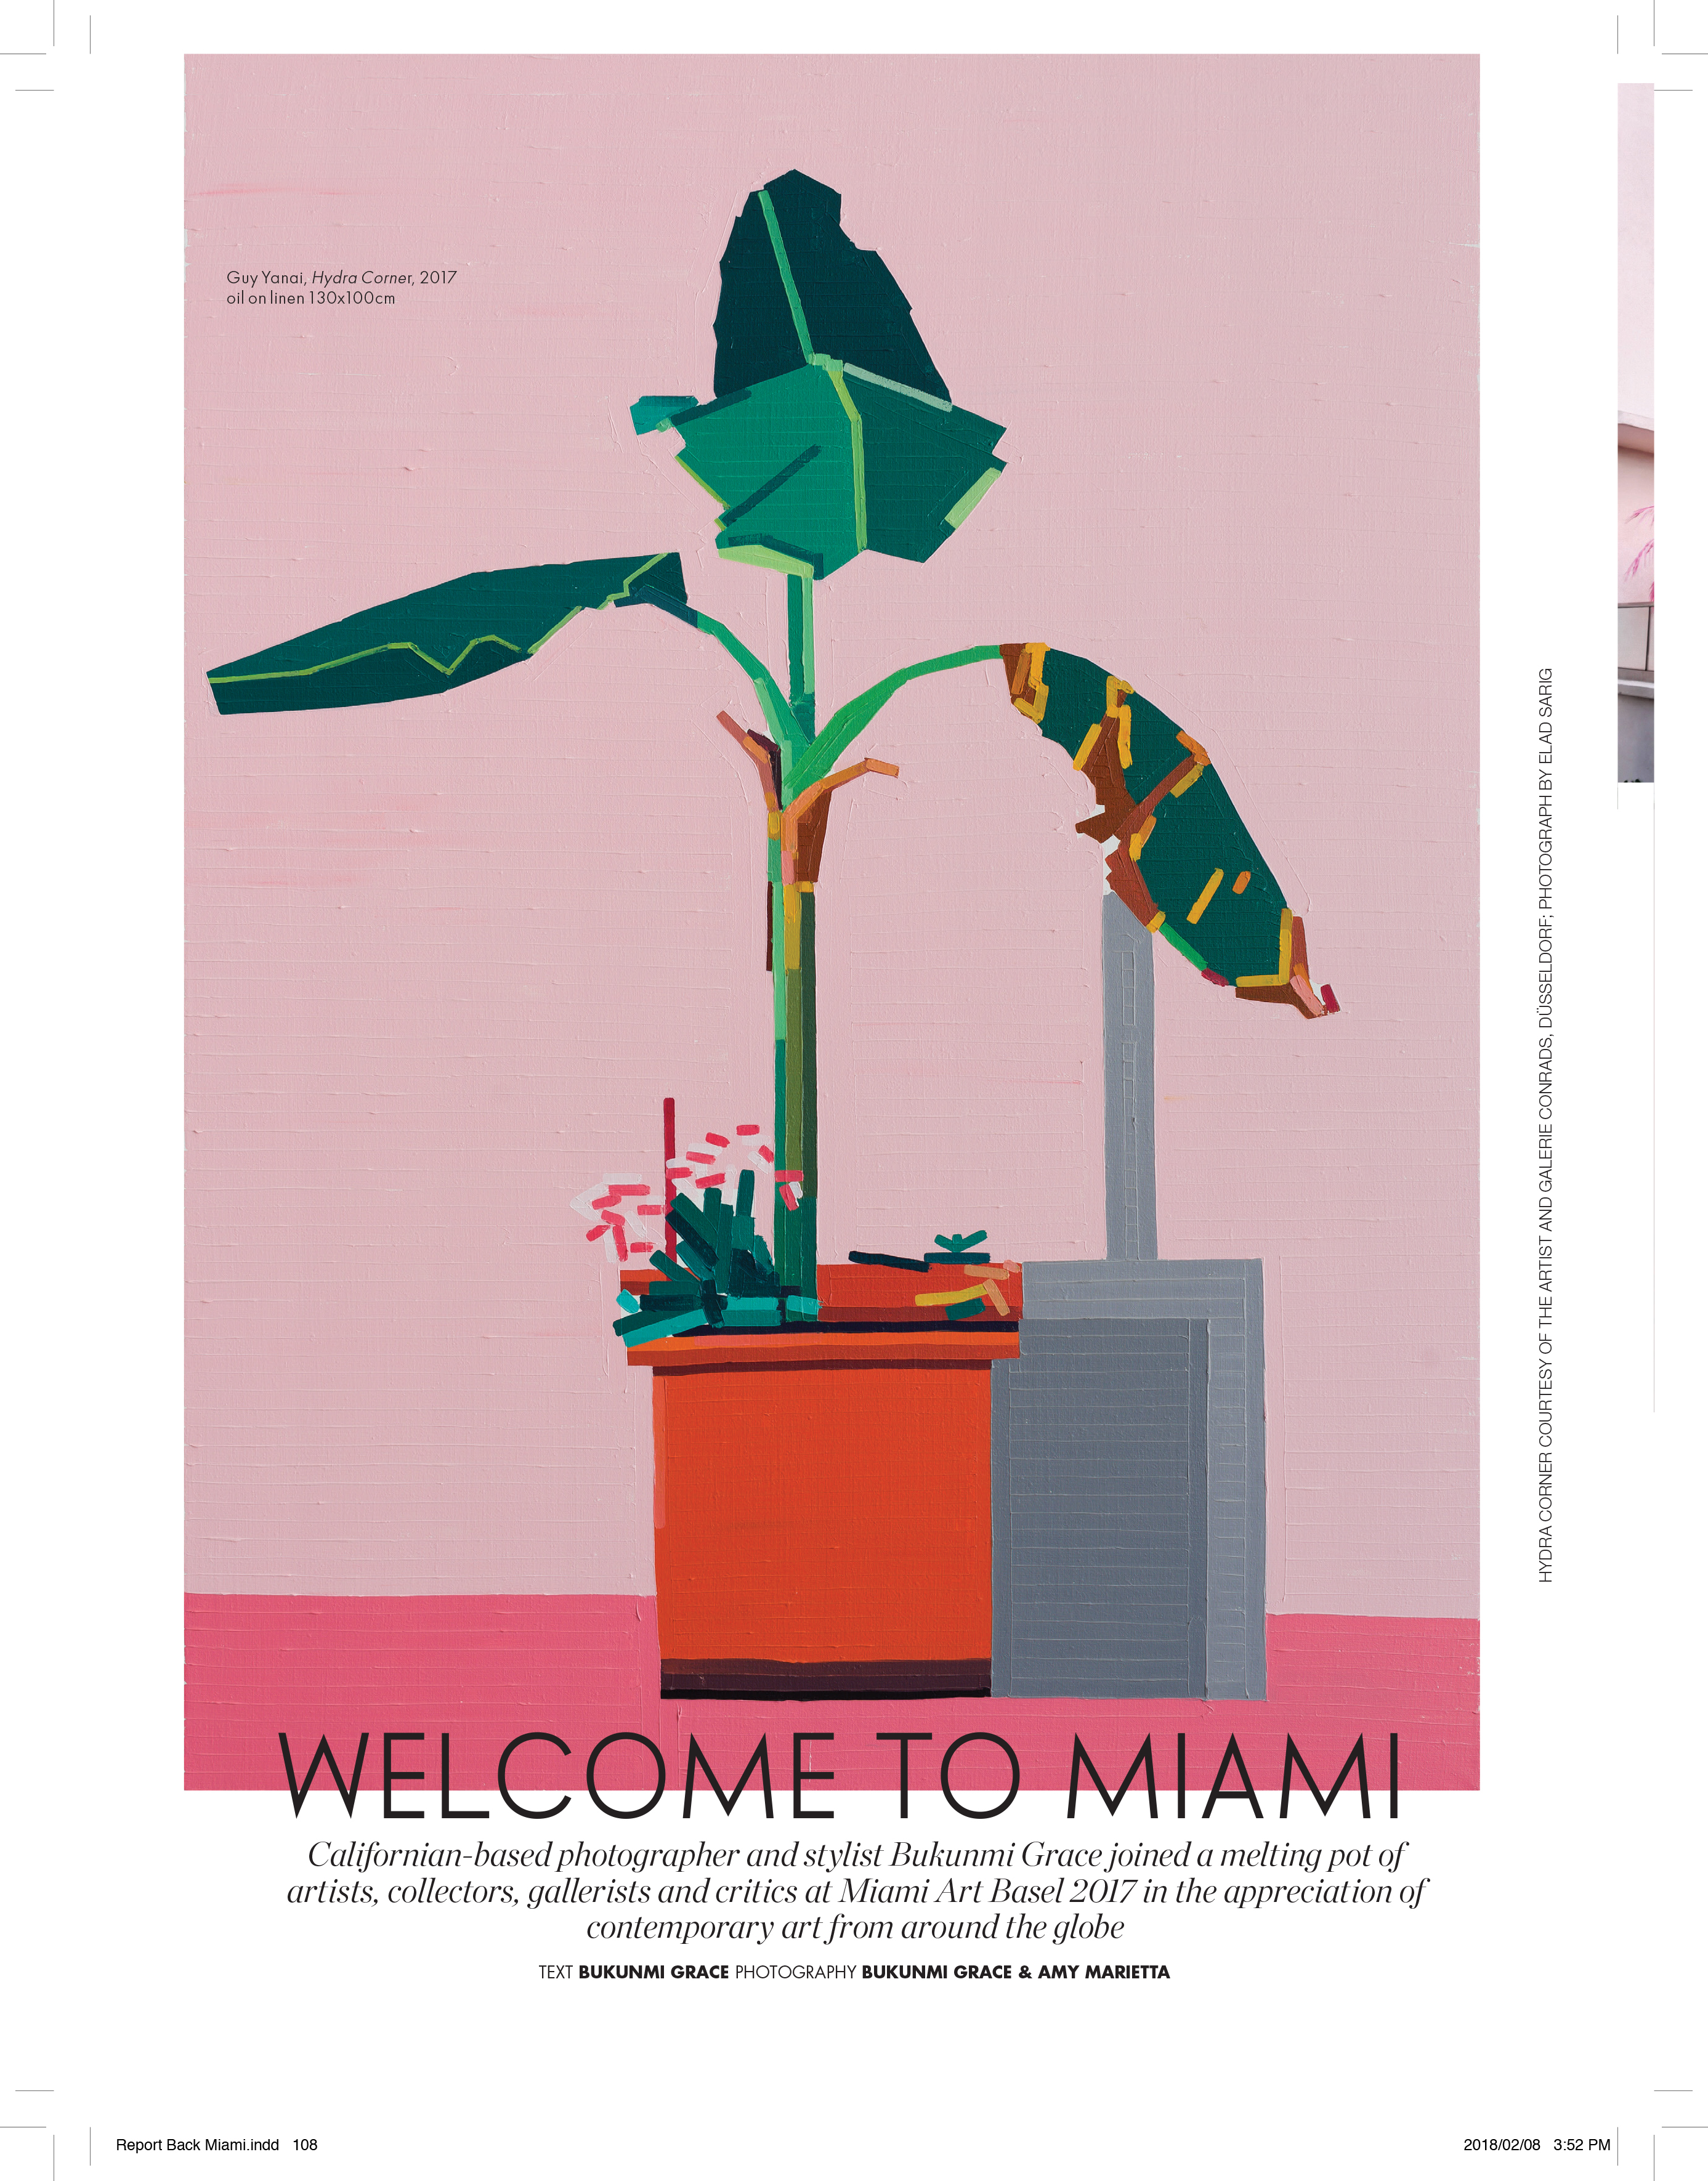 Report Back Miami.indd